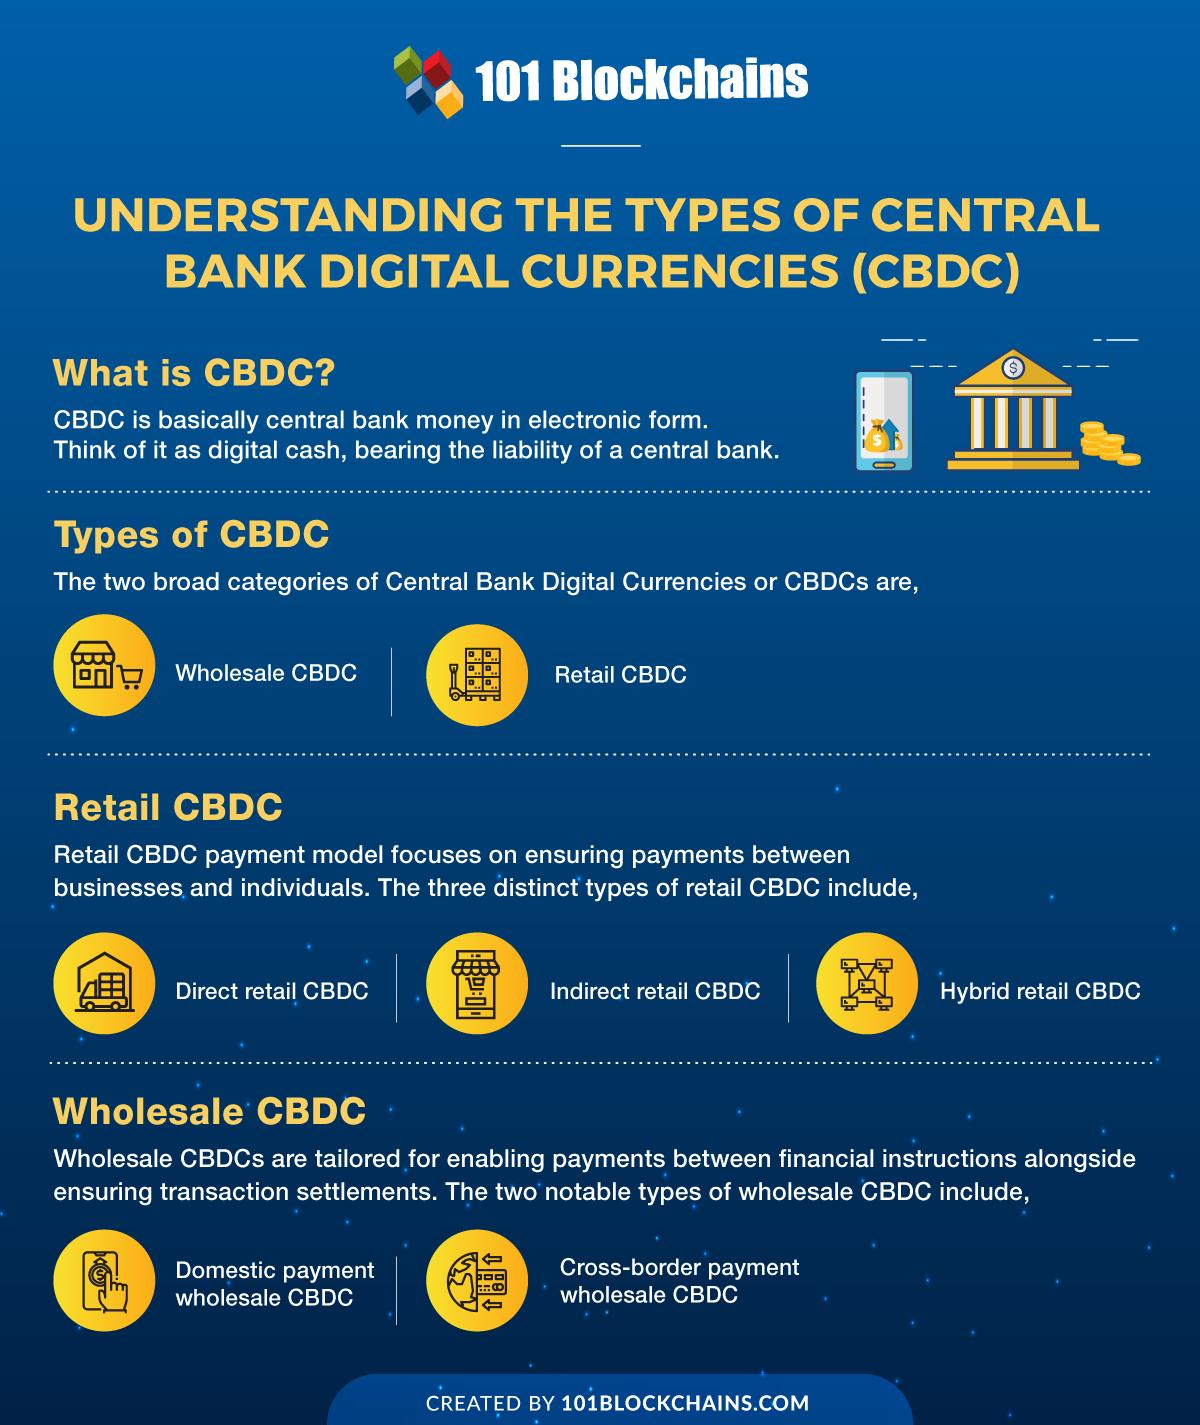 types of CBDC